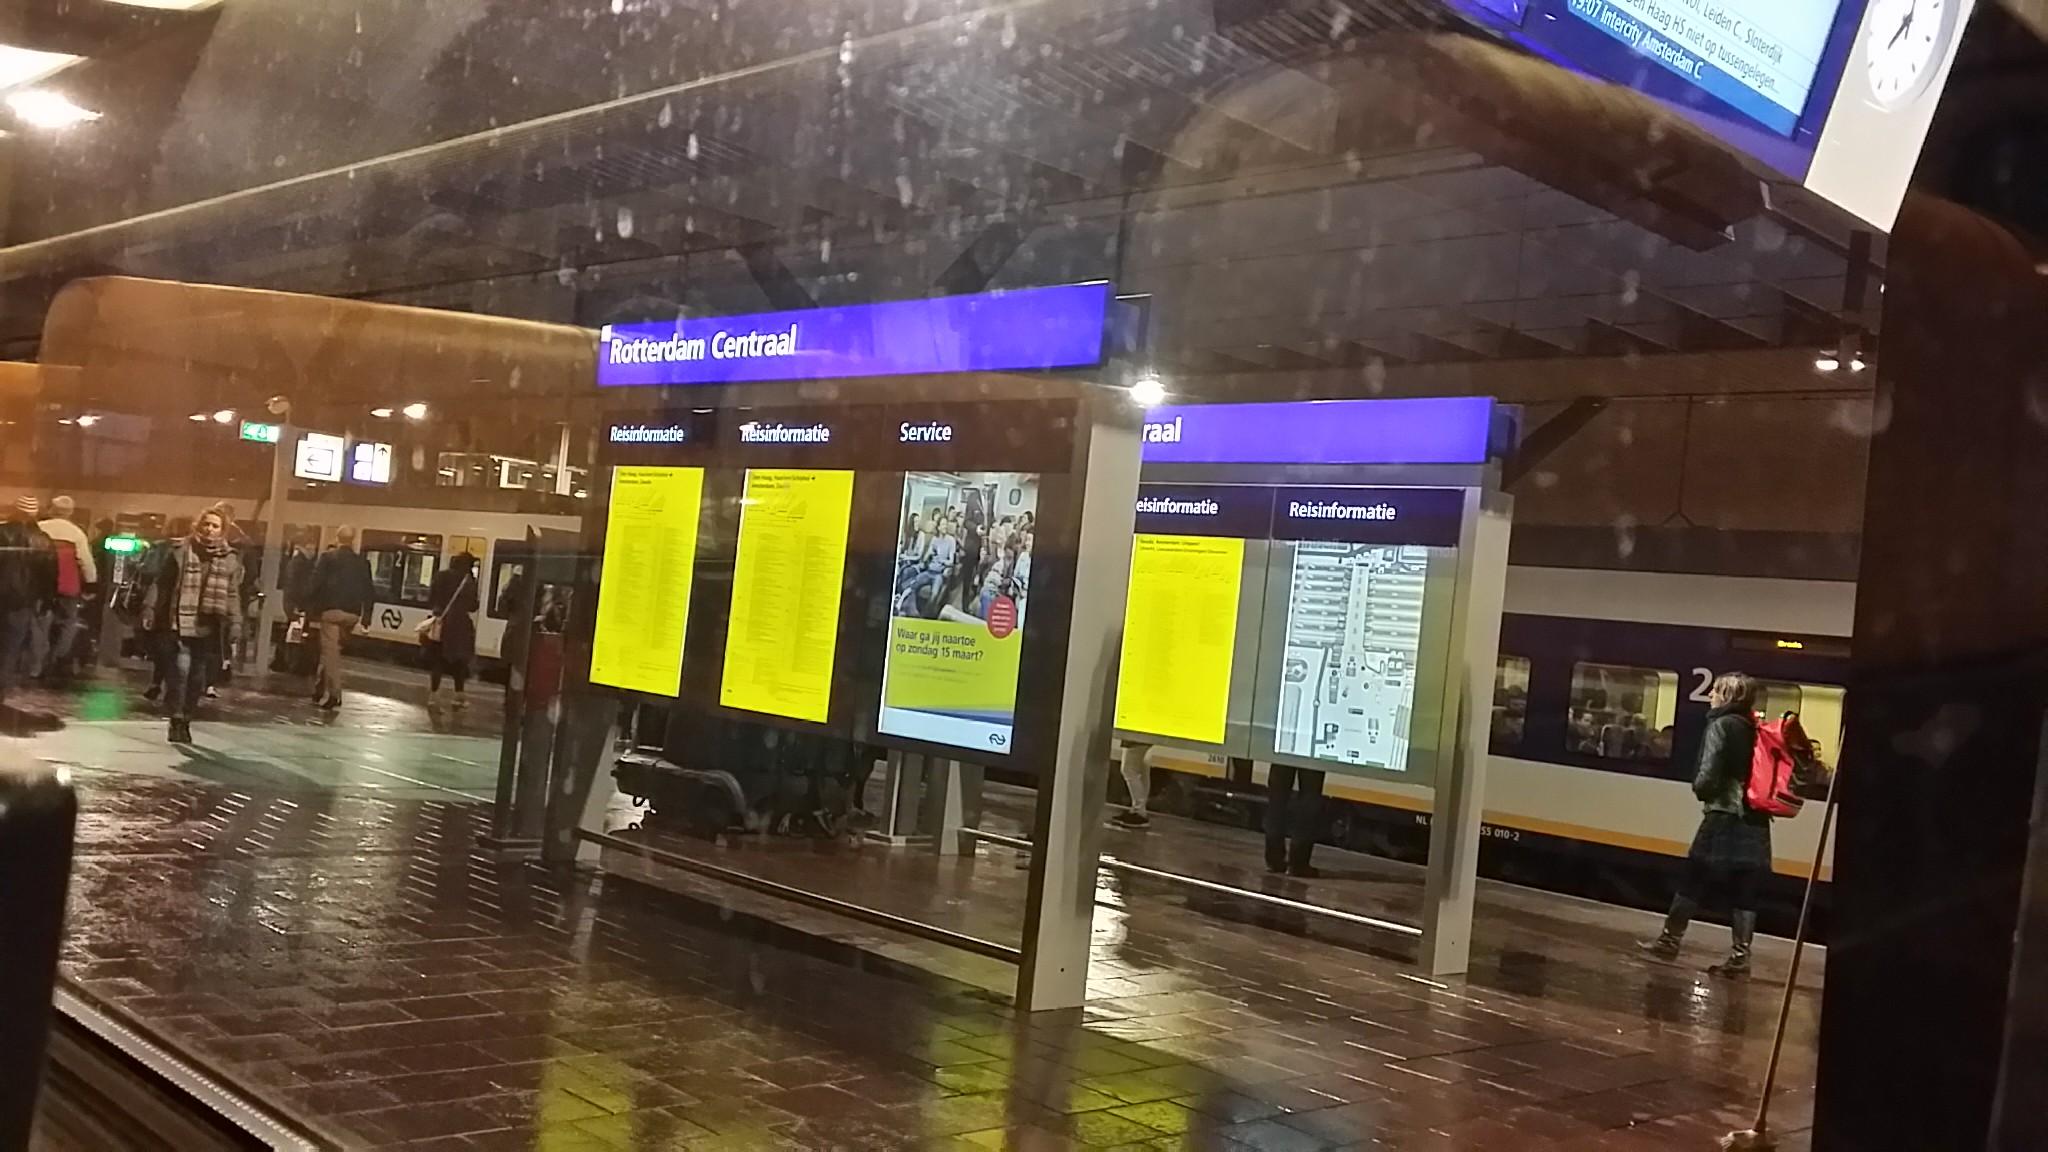 Stasiun Rotterdam 2015-03-11 18.58.51